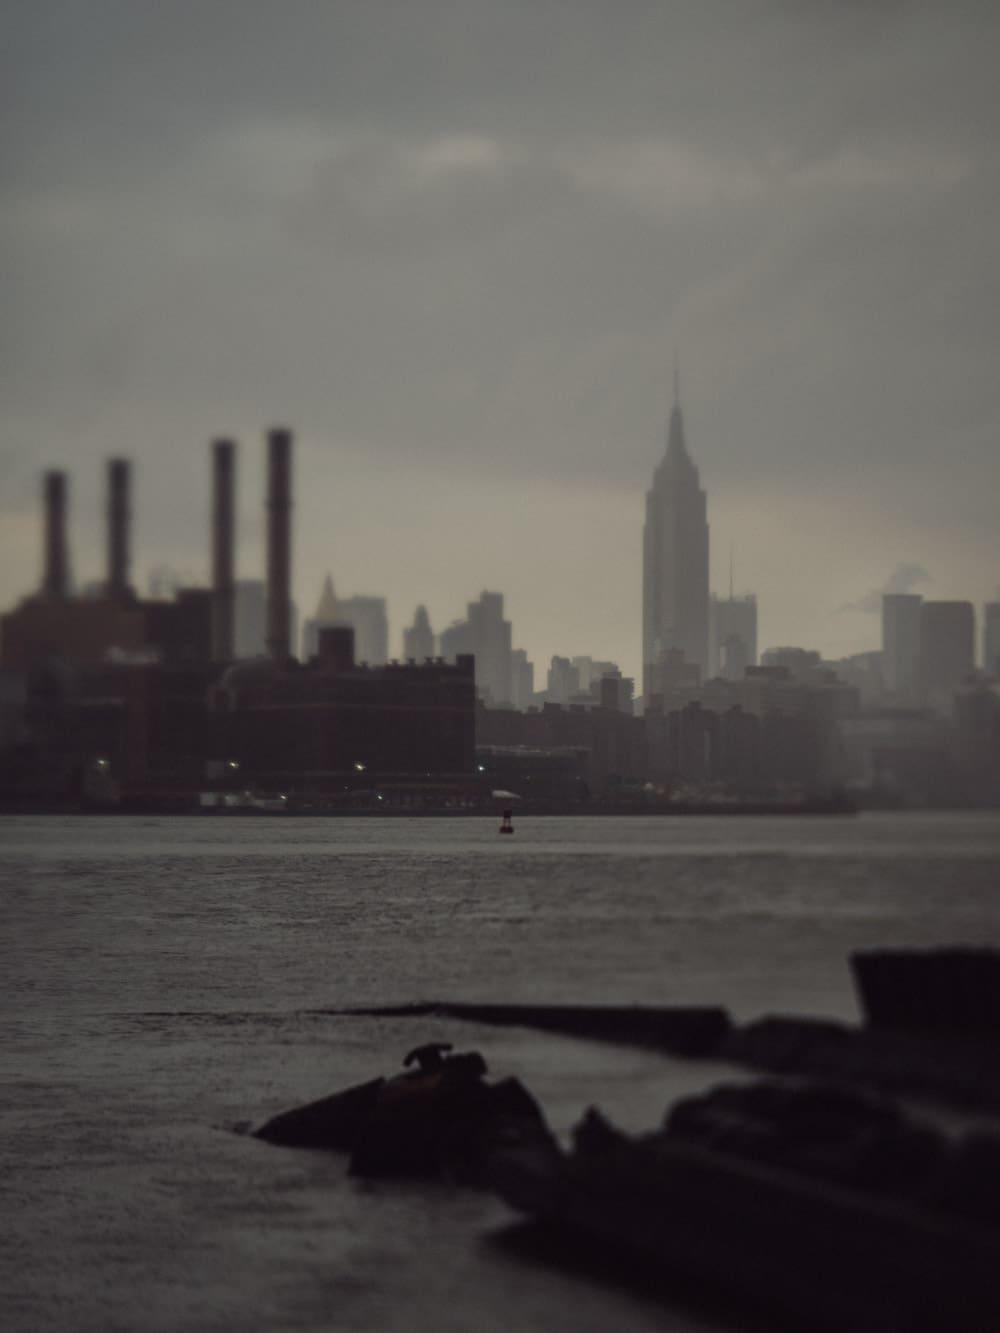 stilpirat_logbuch_new_york_logbuch-3-1-11